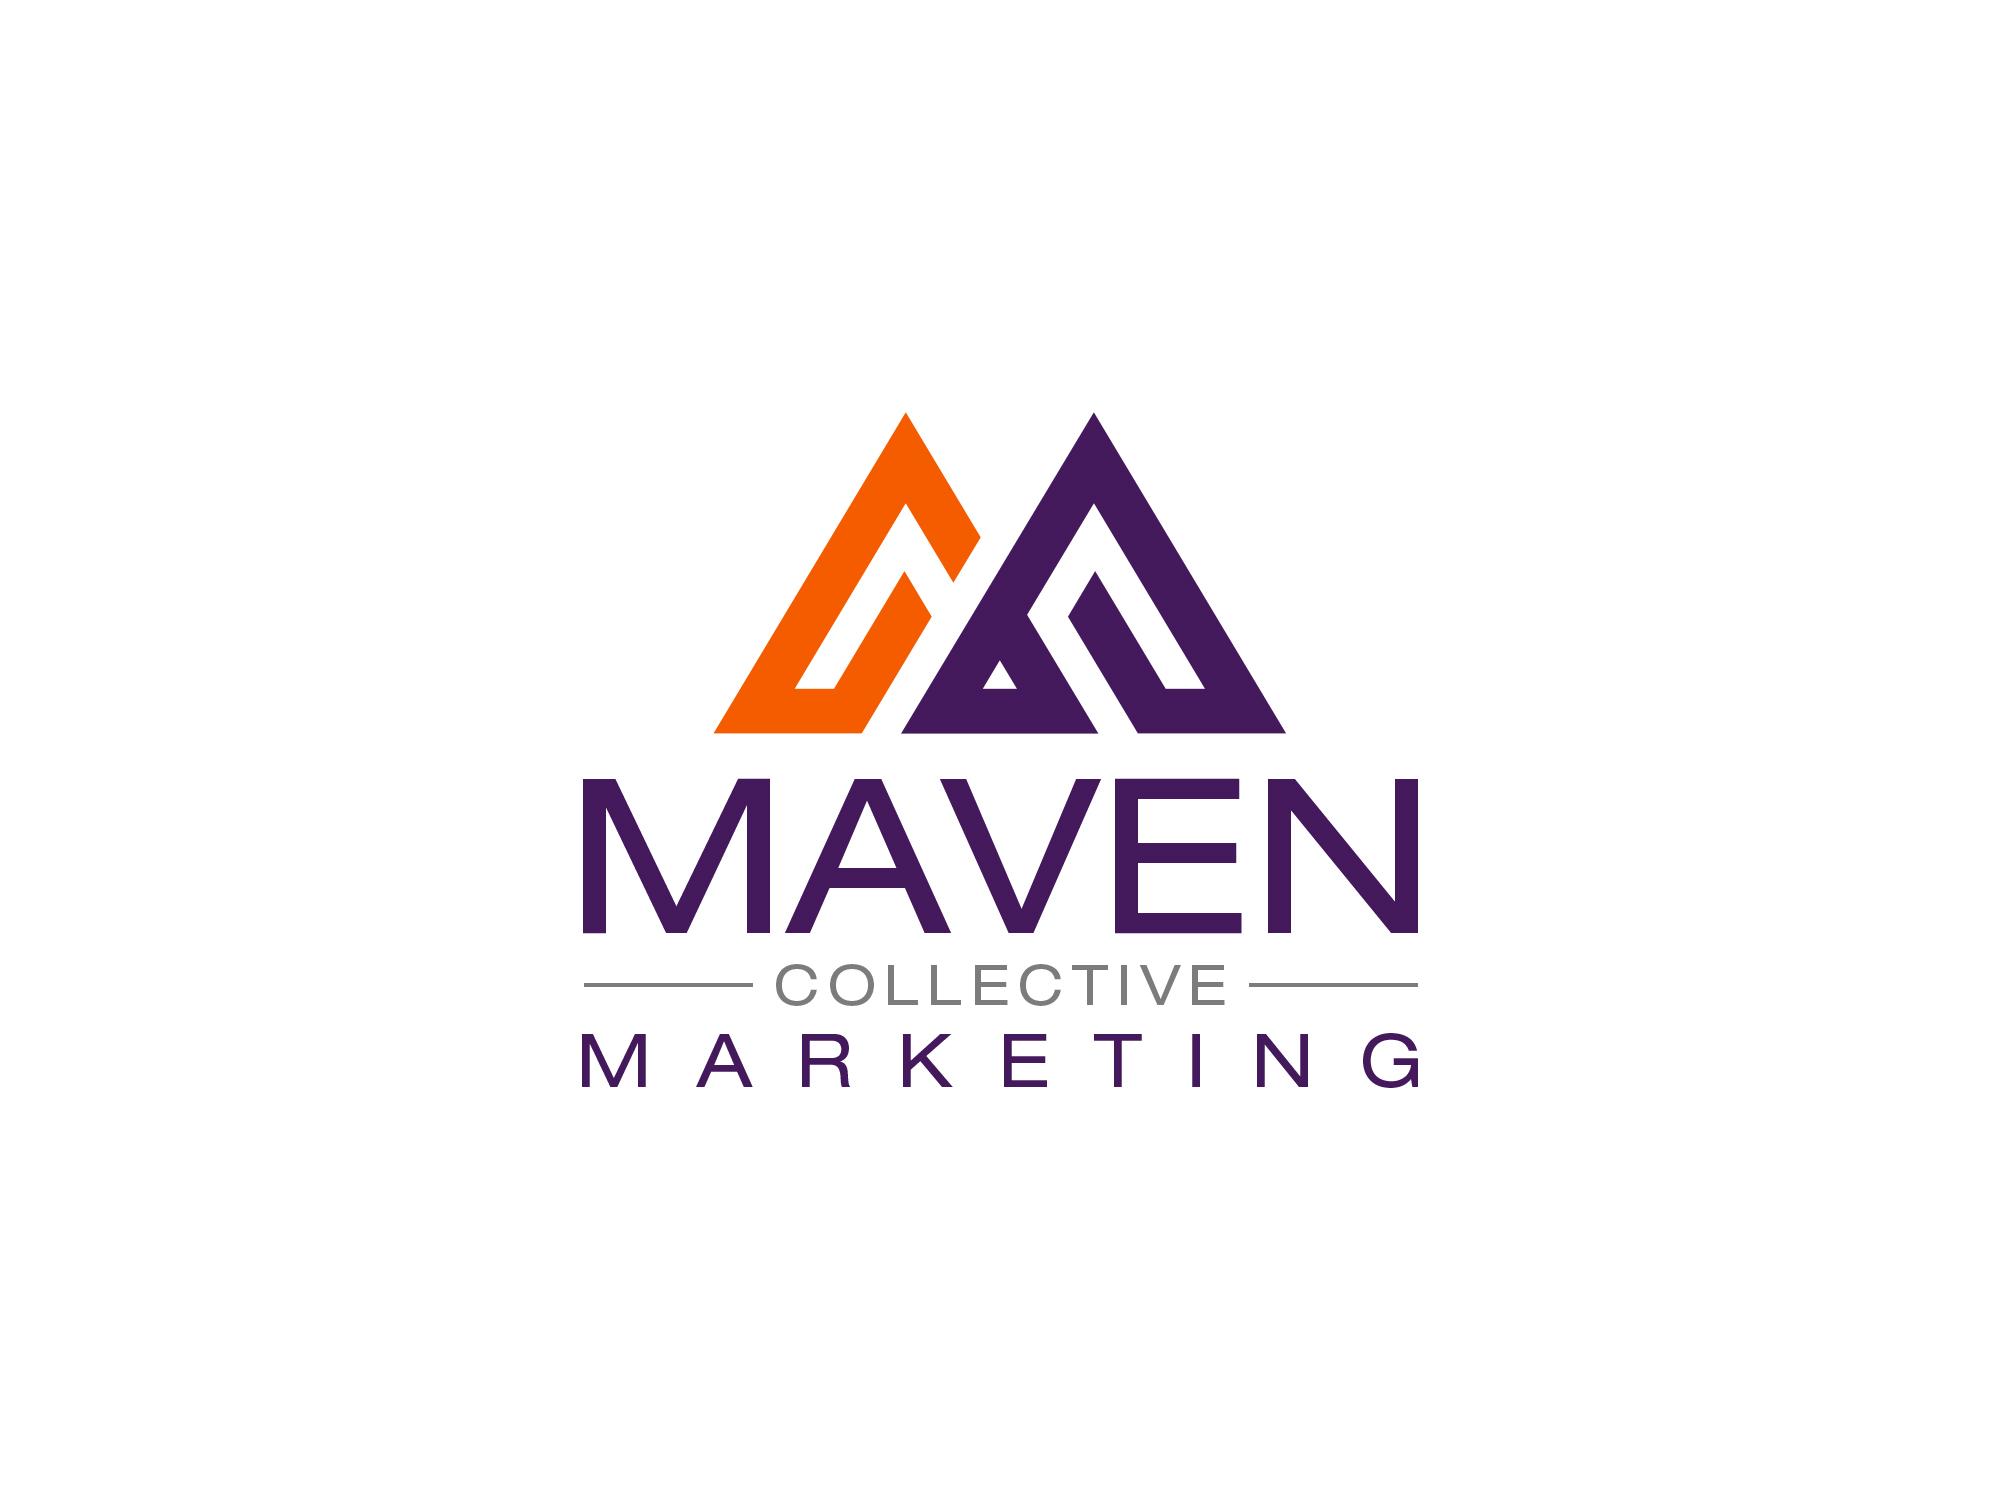 Maven Logos